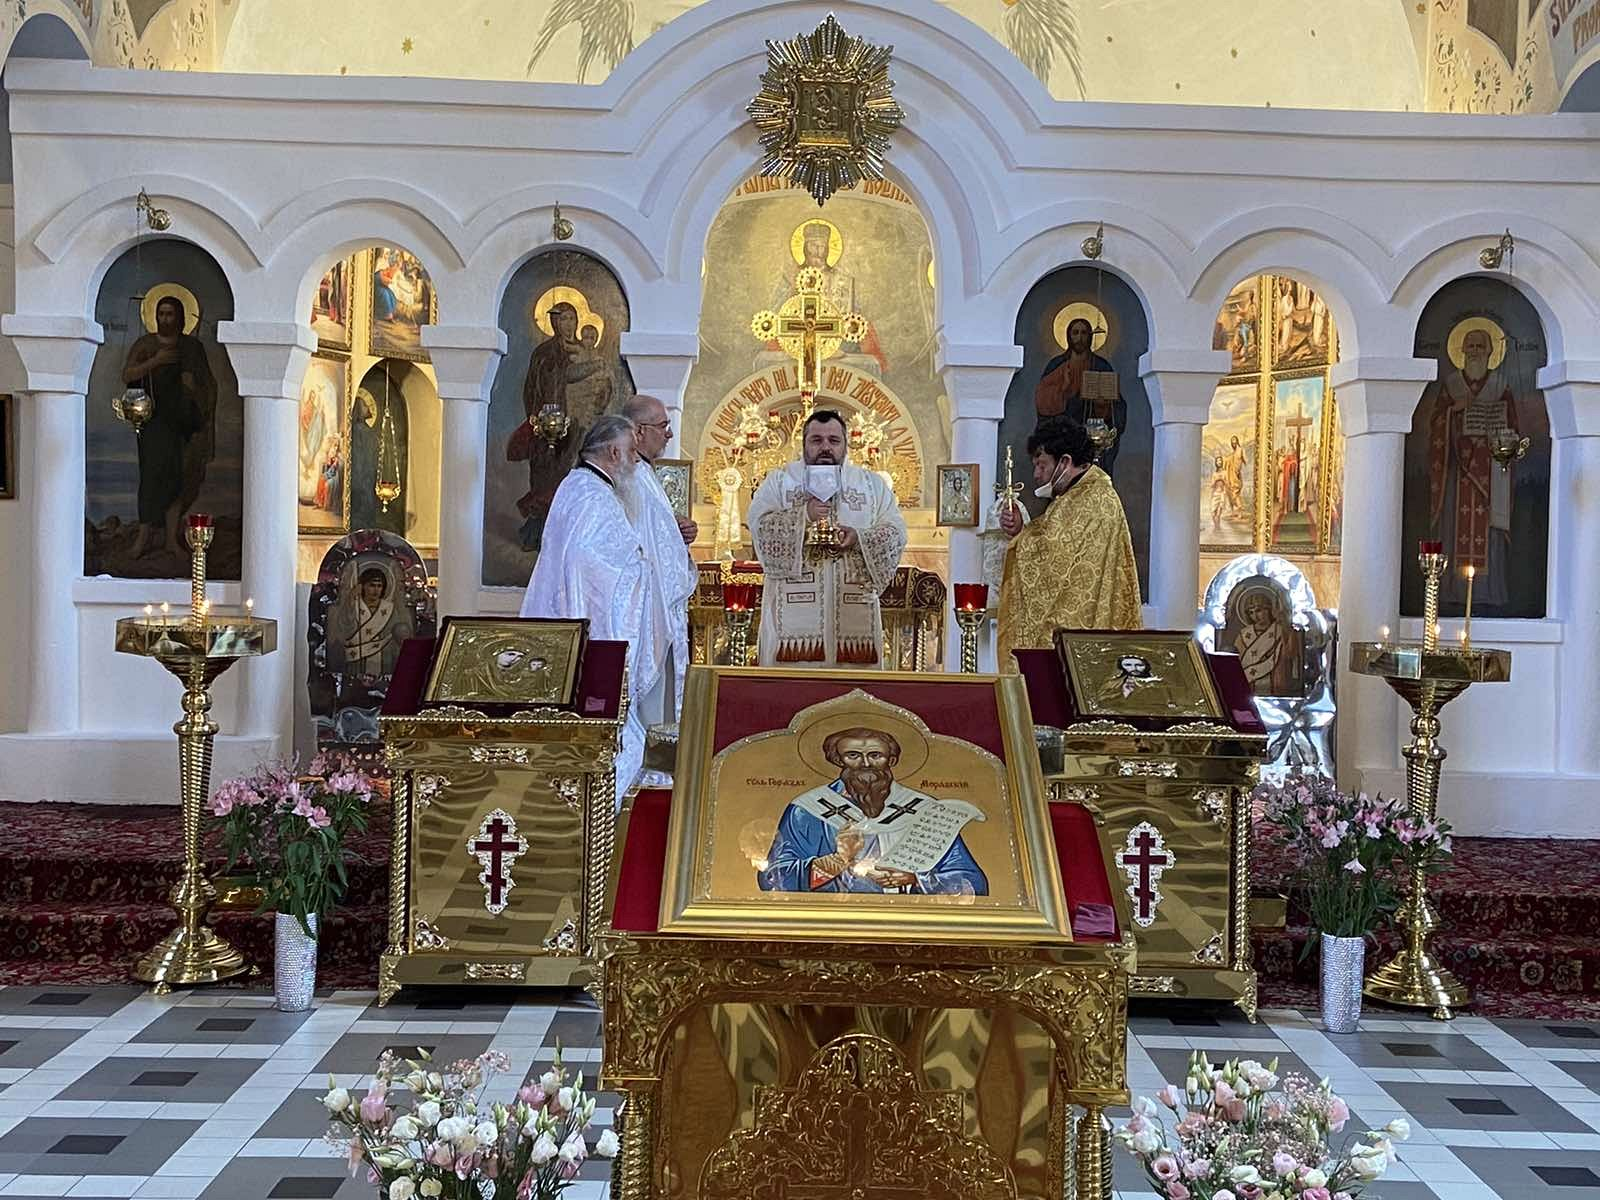 2021-06-01-presbyterium-liturgie-62-539B3424-8FF2-45CF-89B9-B23297FD83EF_1